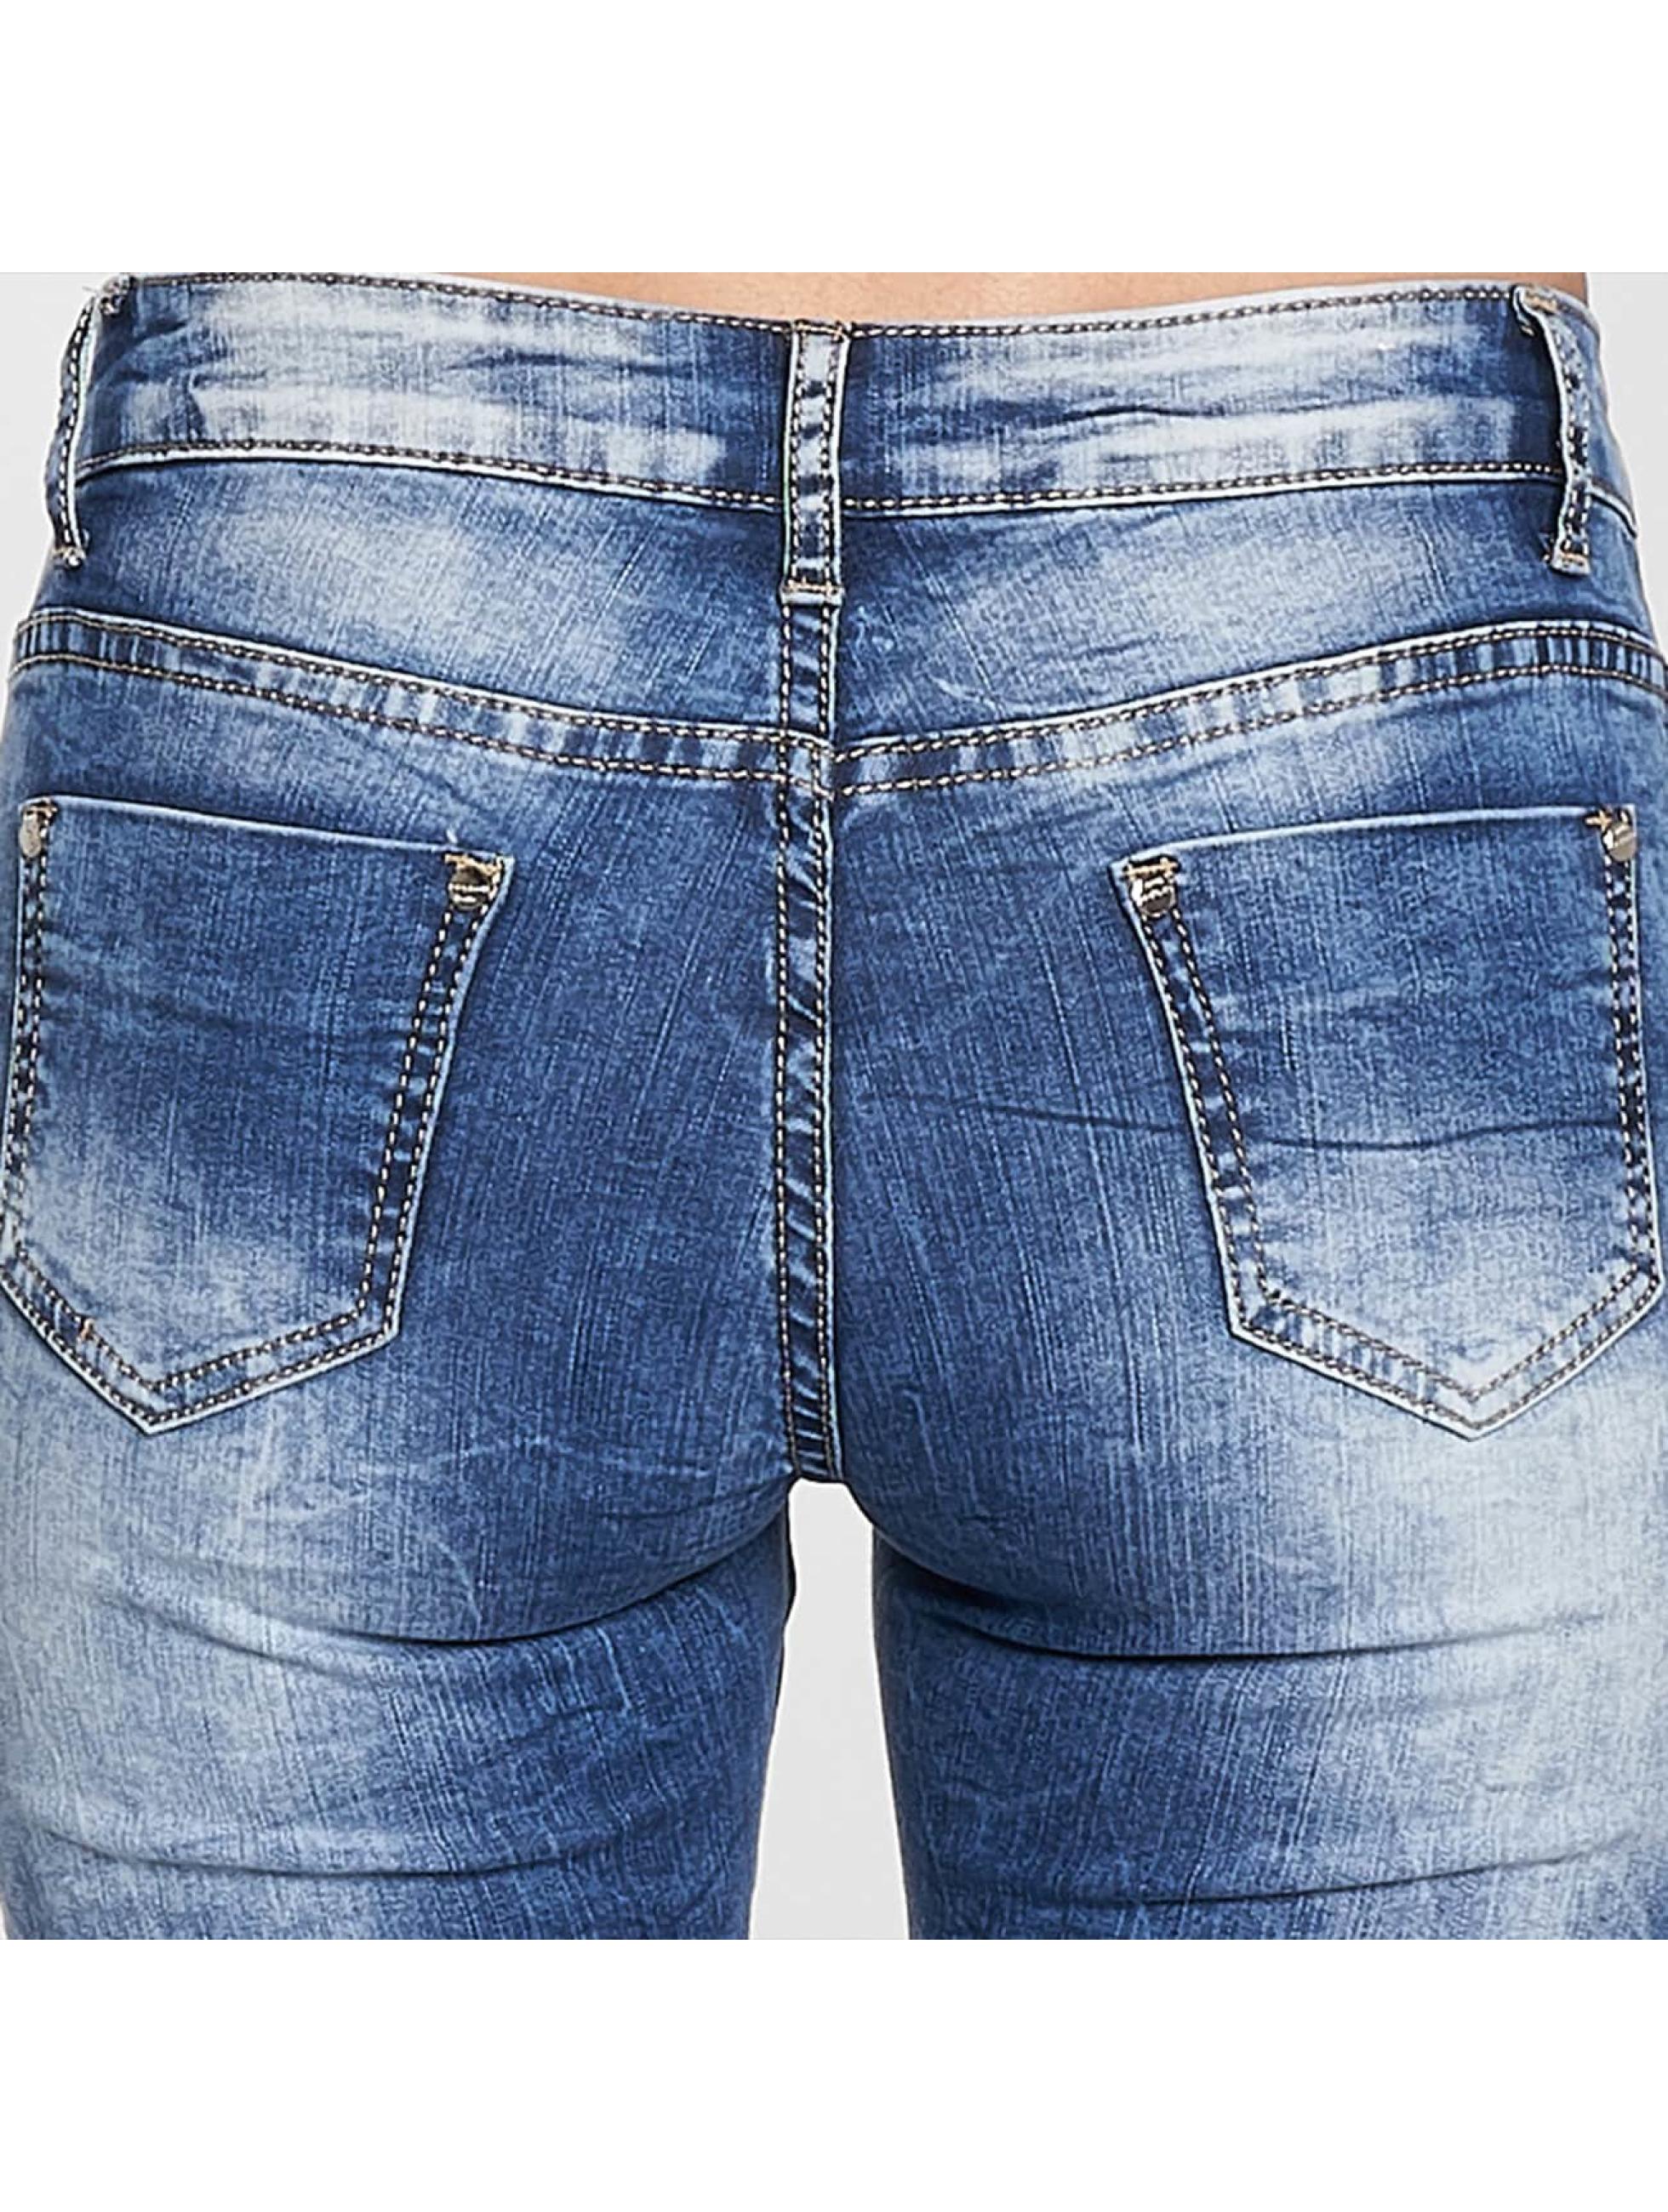 Leg Kings Облегающие джинсы Maatana синий